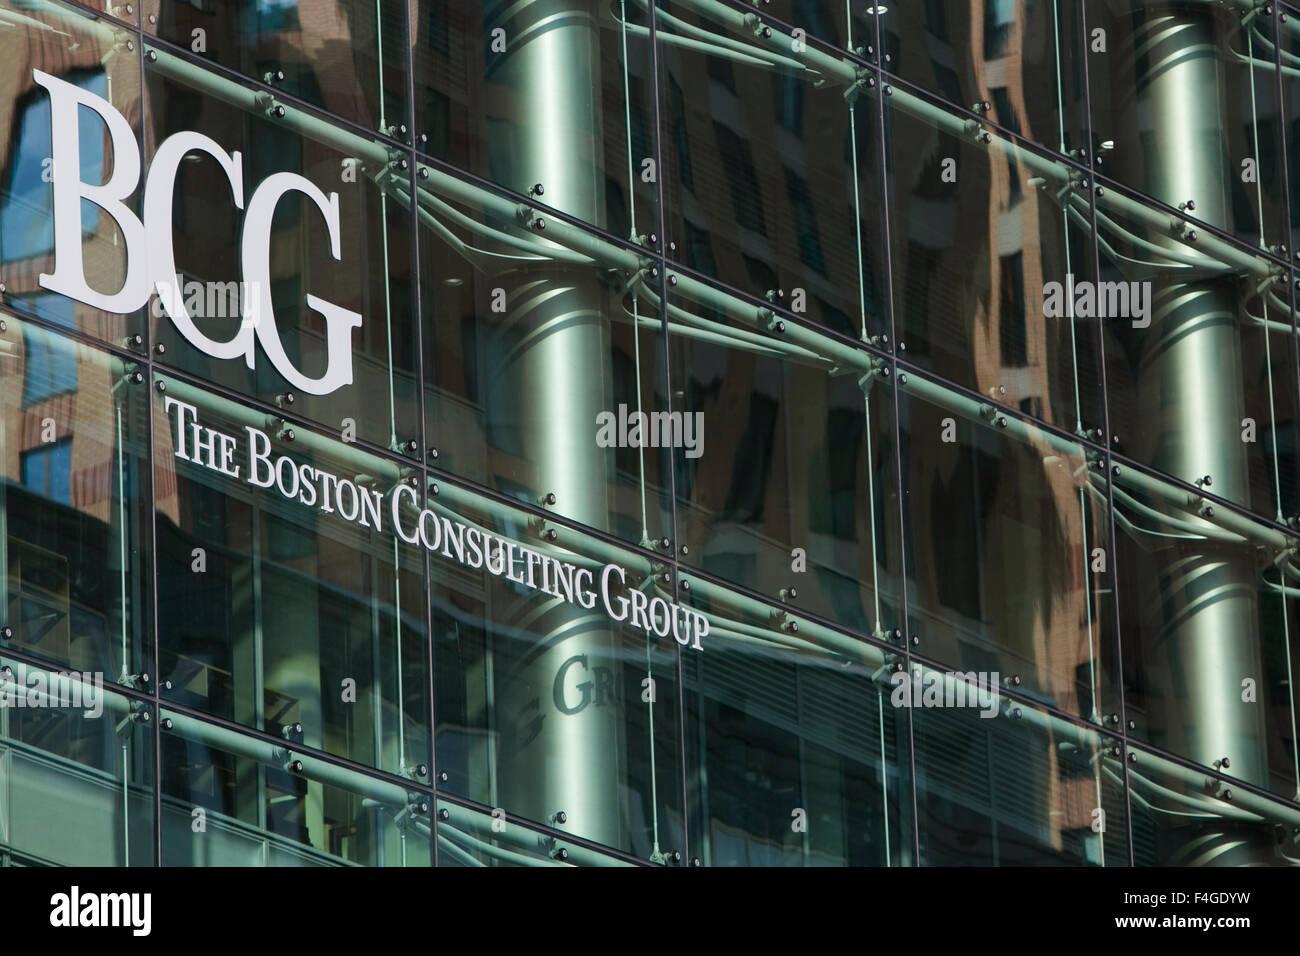 Un logotipo signo exterior de un edificio de oficinas ocupadas por el Boston Consulting Group en Amsterdam, Holanda, Imagen De Stock